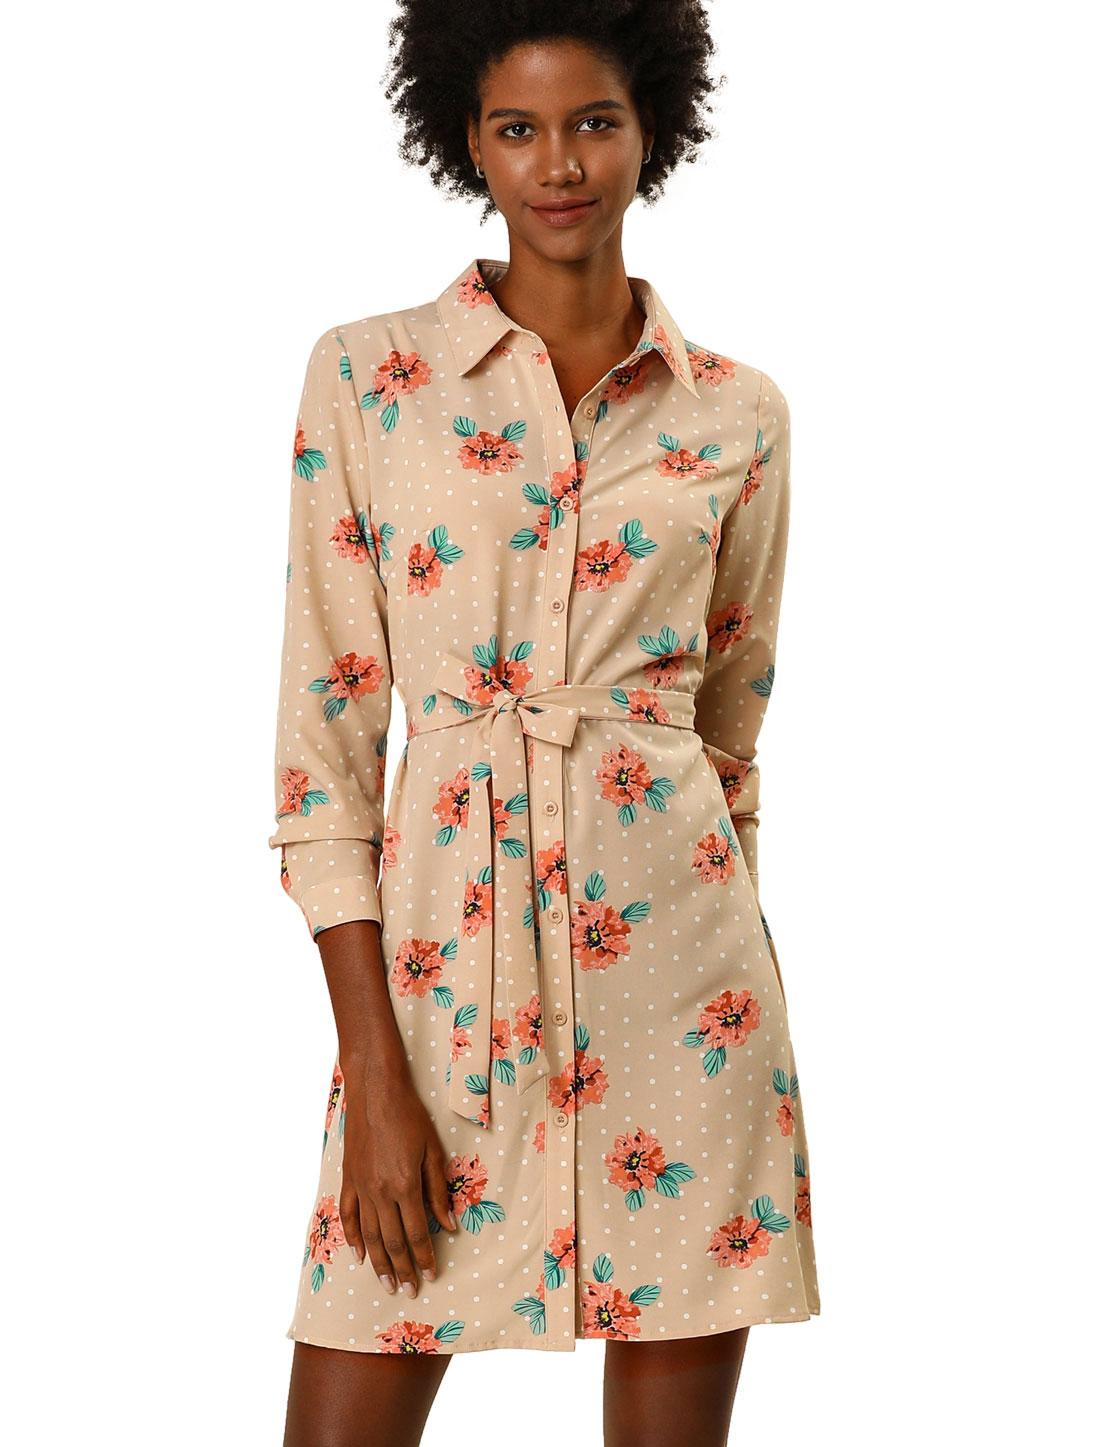 Allegra K Women's Button Down Polka Dots Floral Shirt Dress Apricot M